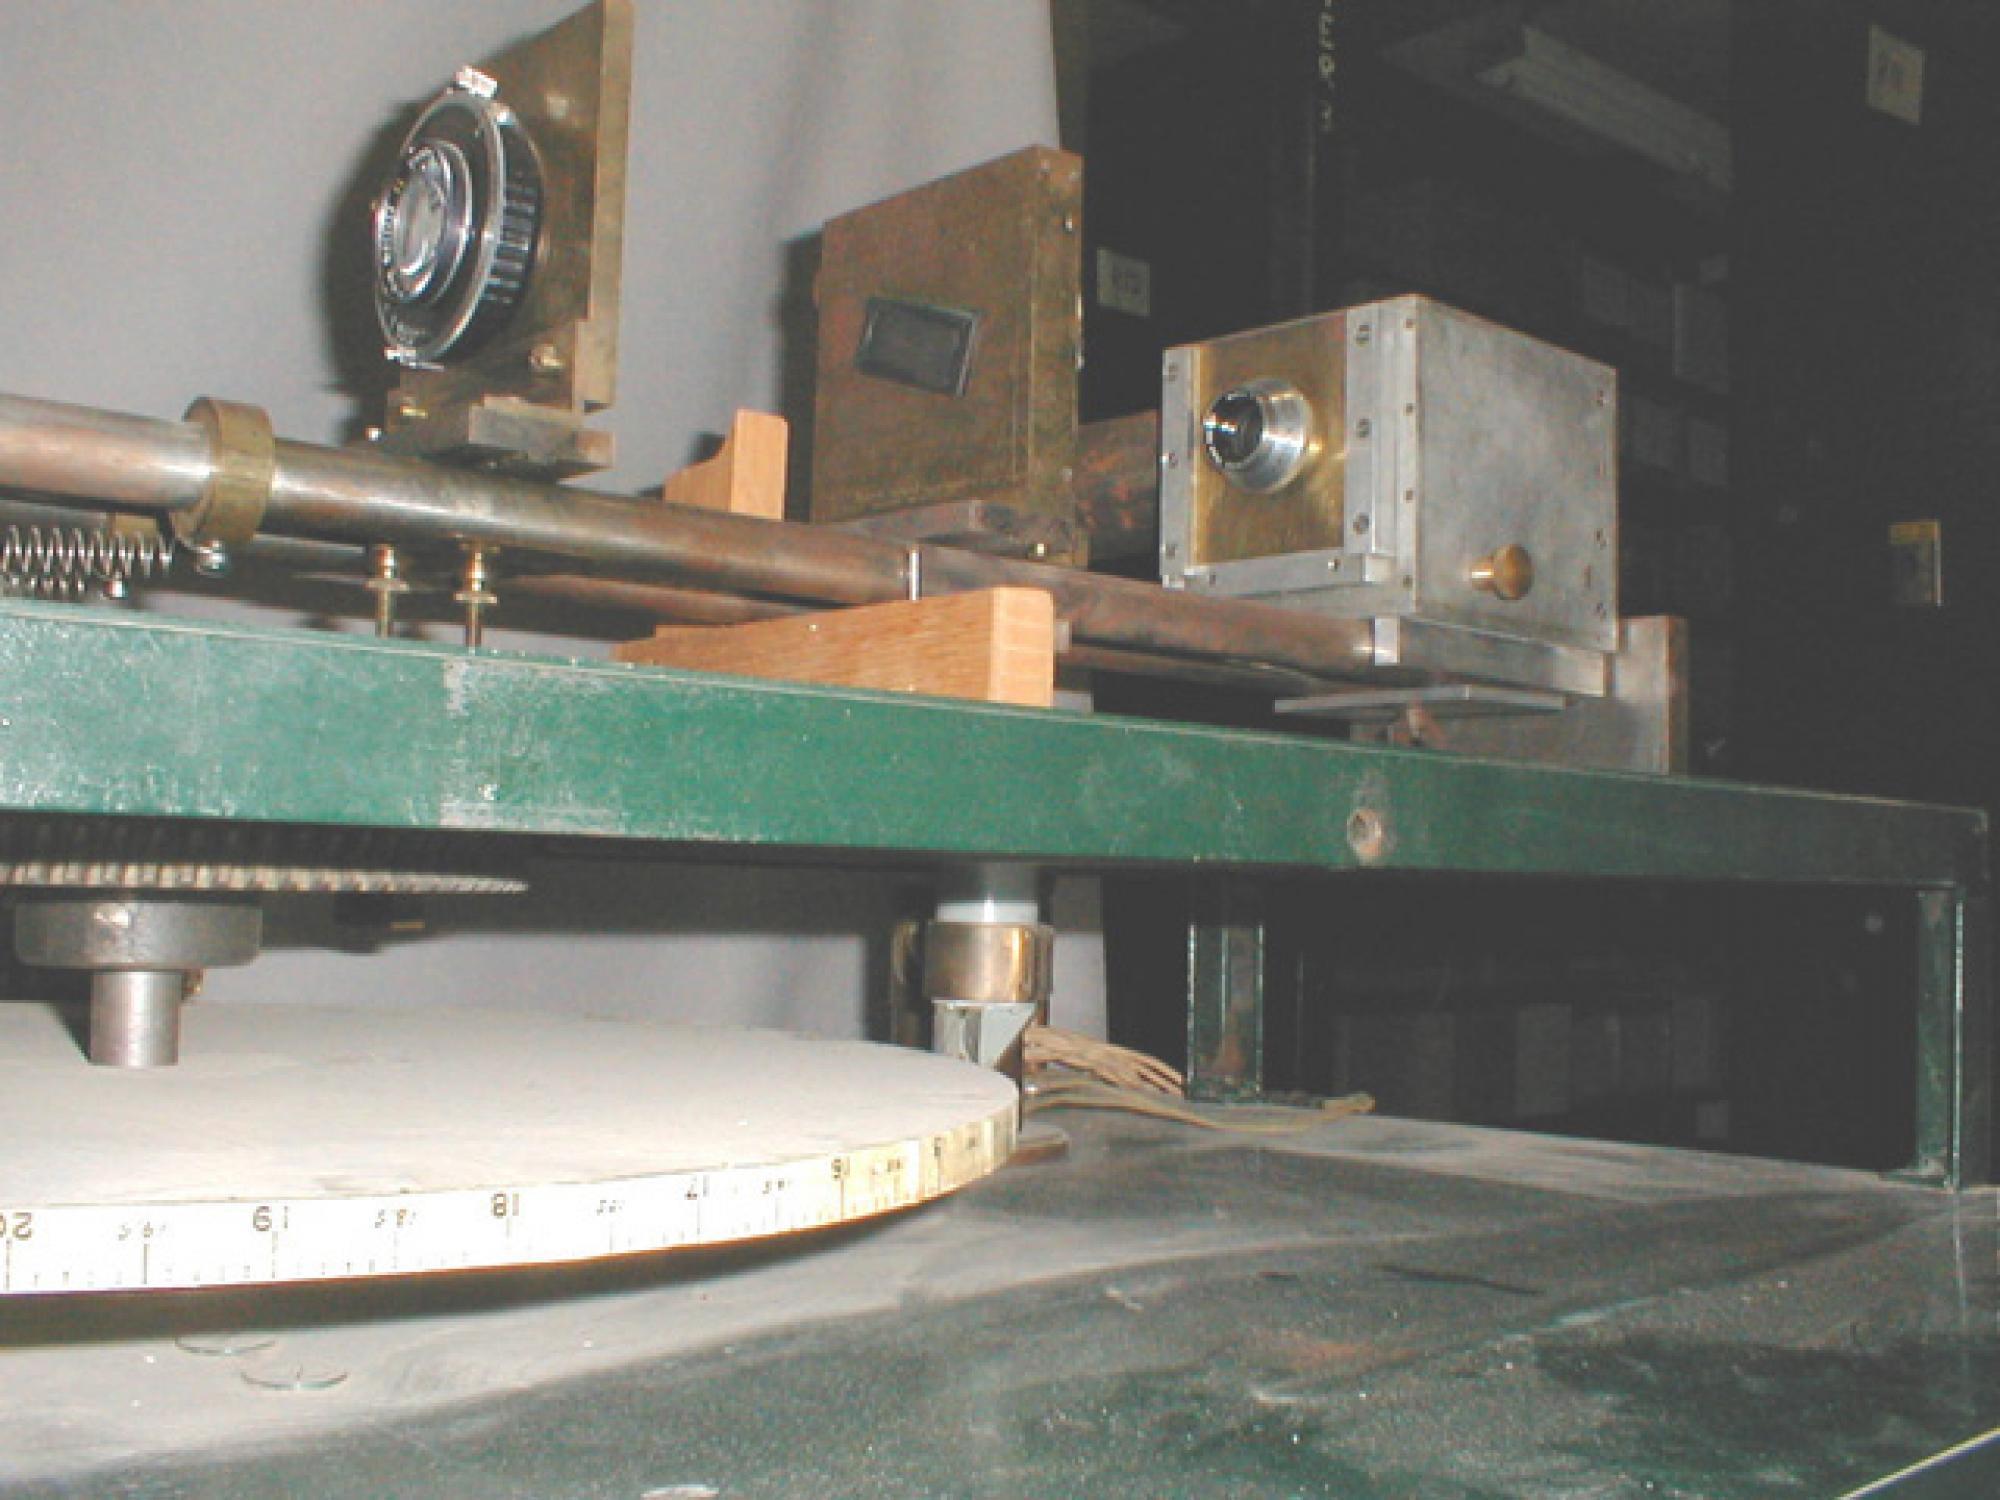 The cycloscope analyzing bench